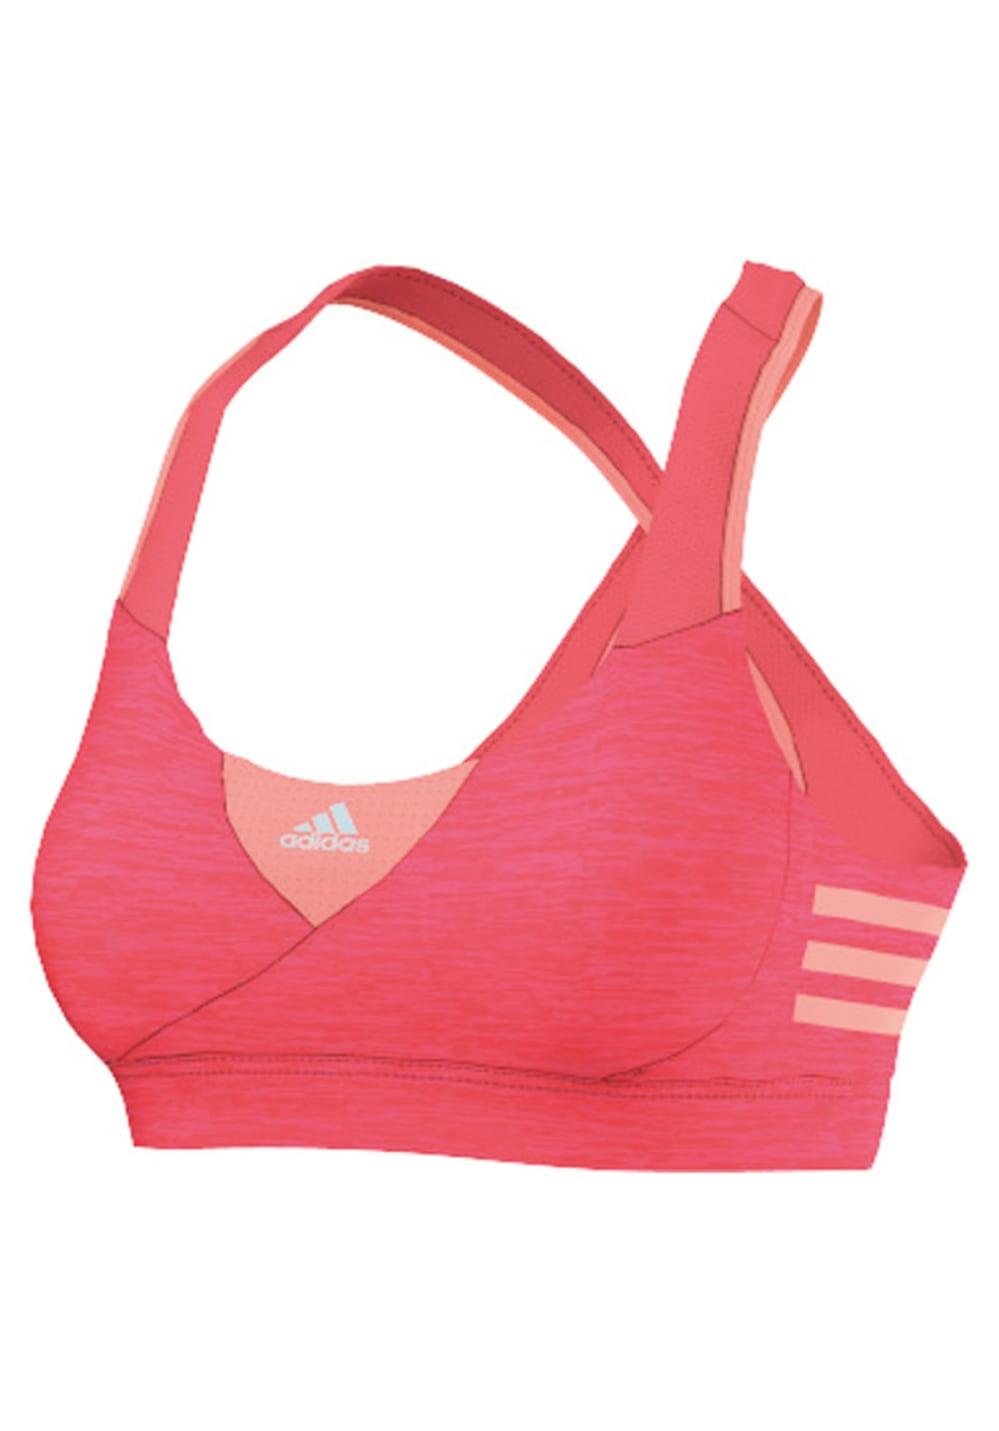 3dbd7217b1 ... adidas Supernova Melange Bra - Sport Bras for Women - Red. Back to  Overview. 1  2. Previous